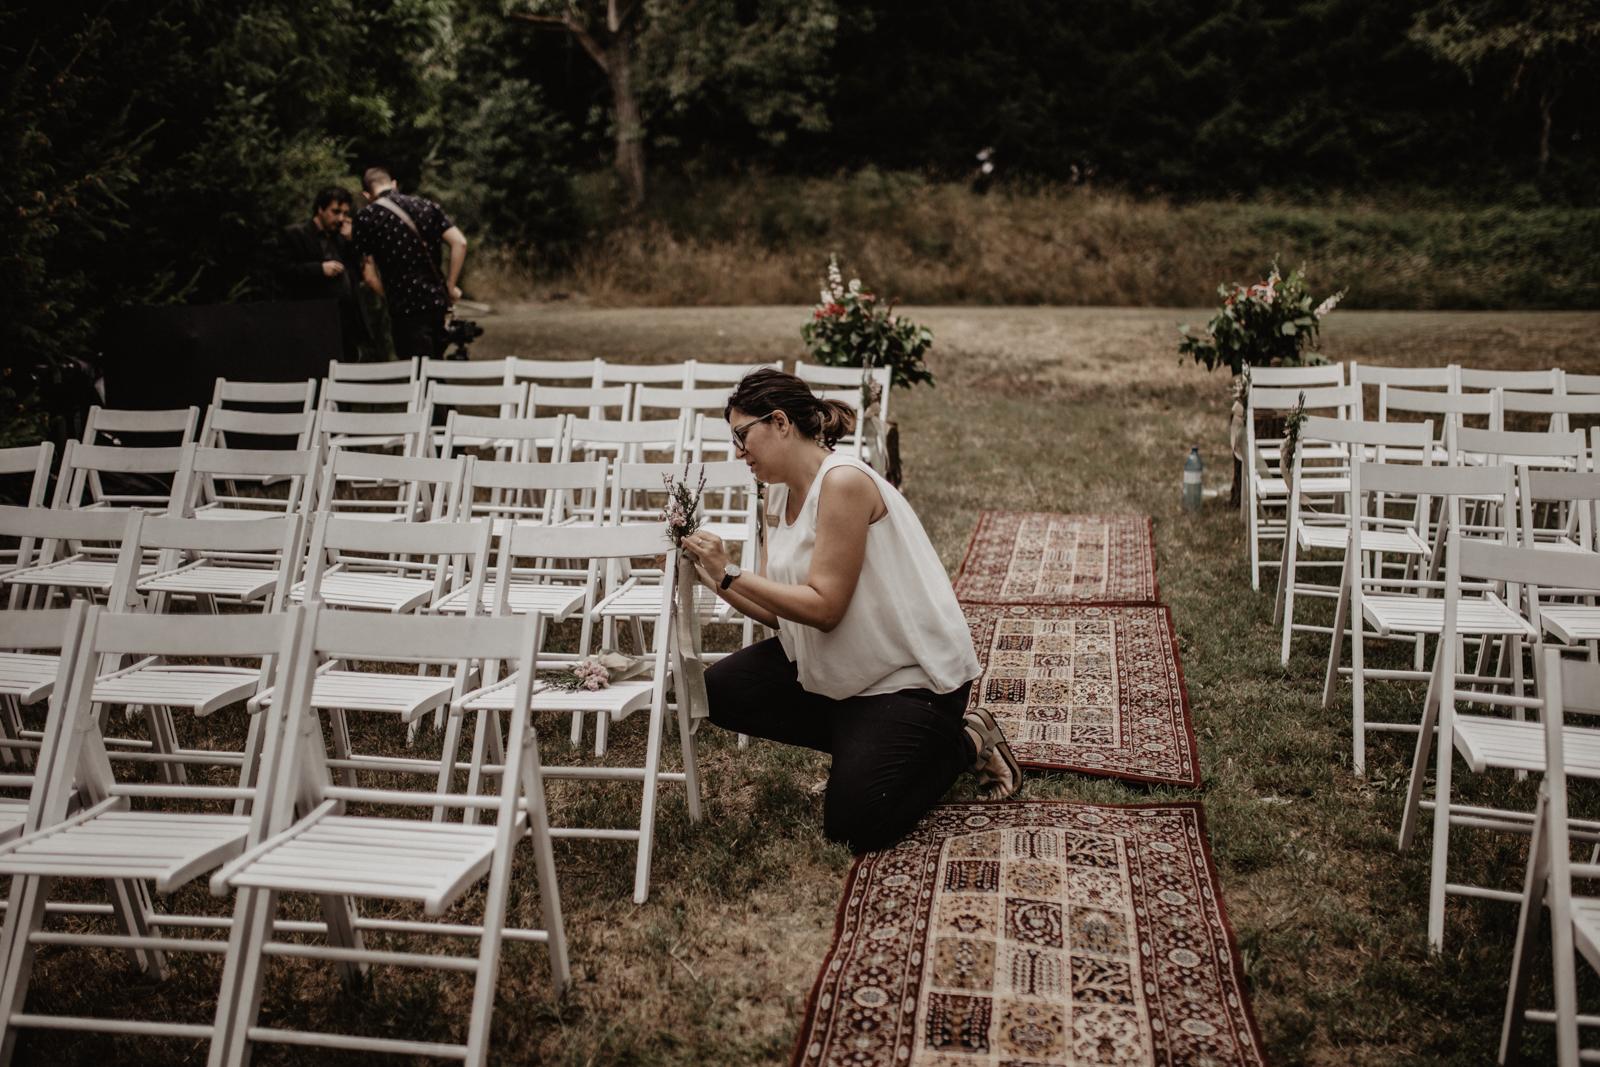 thenortherngirlphotography_photography_thenortherngirl_rebeccascabros_wedding_weddingphotography_weddingphotographer_barcelona_bodaenbarcelona_bodaenmaselmarti_bodarogeryvane-244.jpg